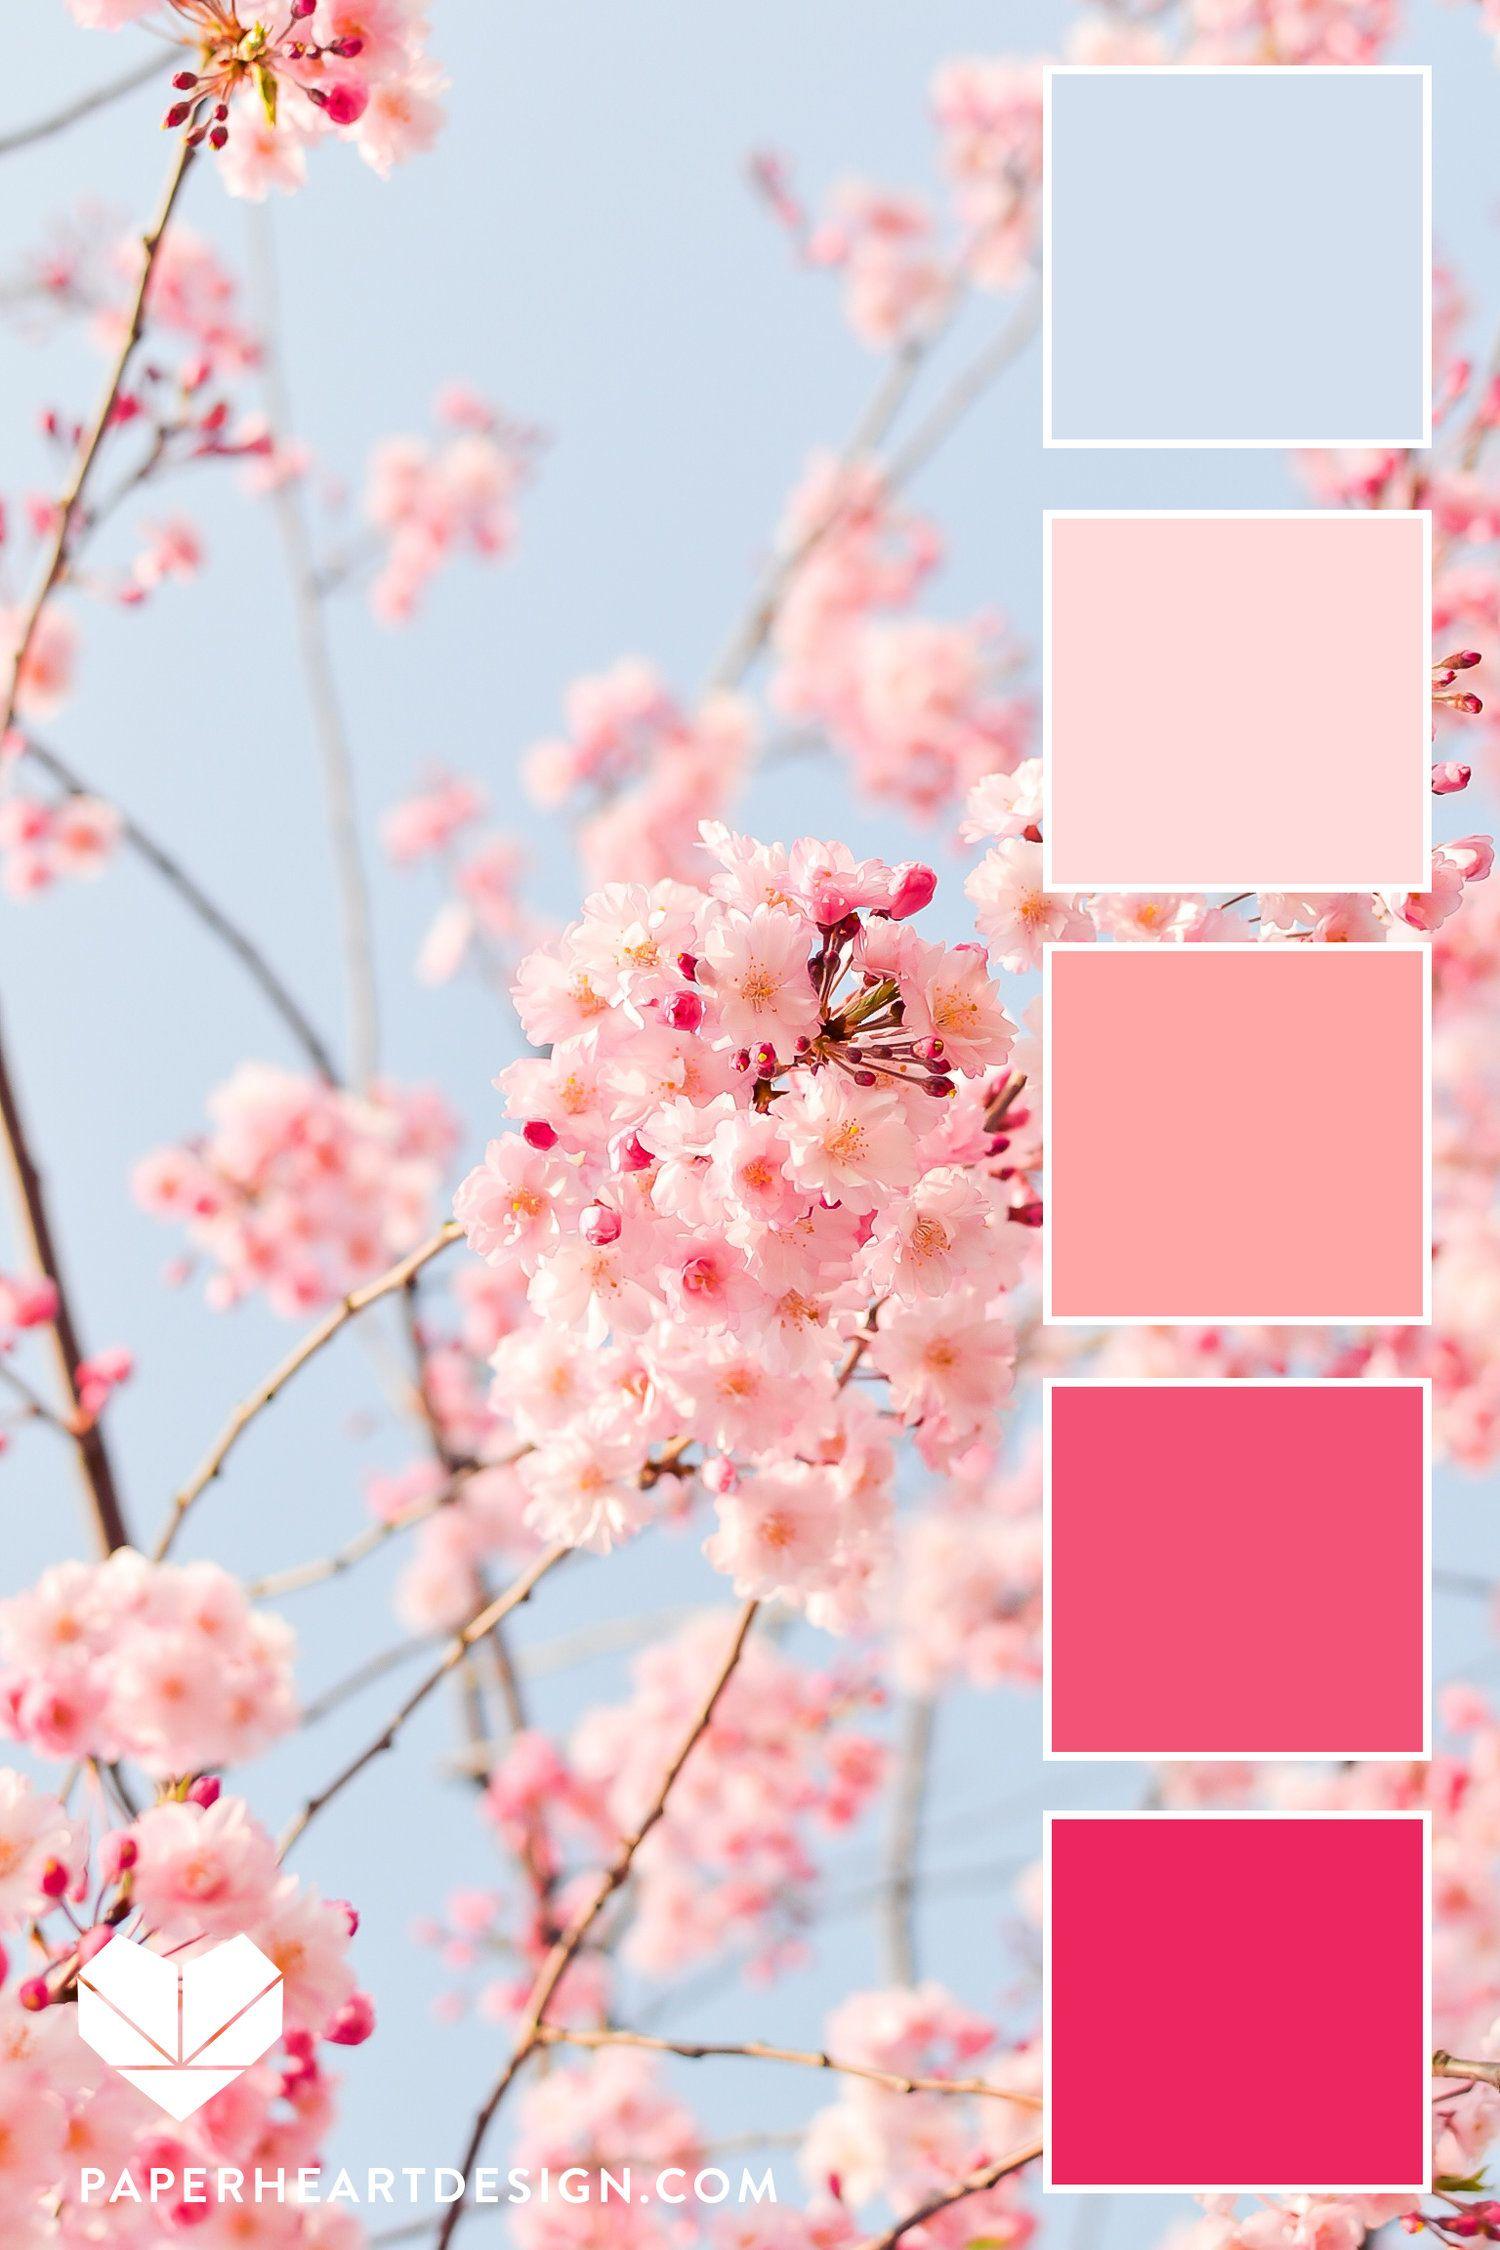 Cherry Blossoms Jvermilyea Cherry Blossom Japan Cherry Blossom Flowers Sakura Cherry Blossom